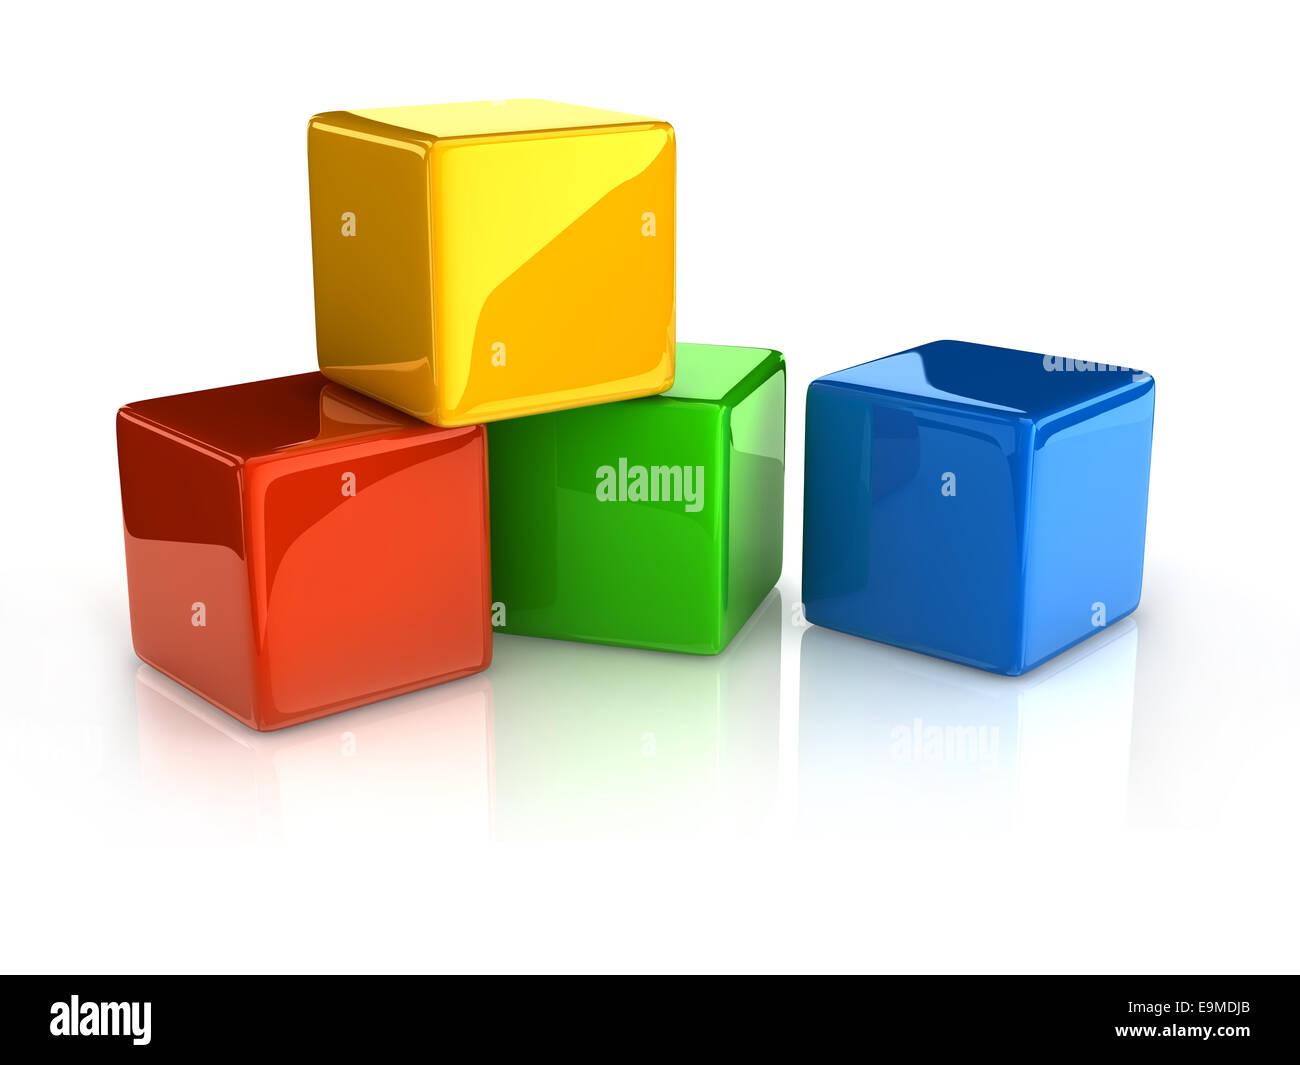 colorful cubes on white background.digitally generated image. - Stock Image